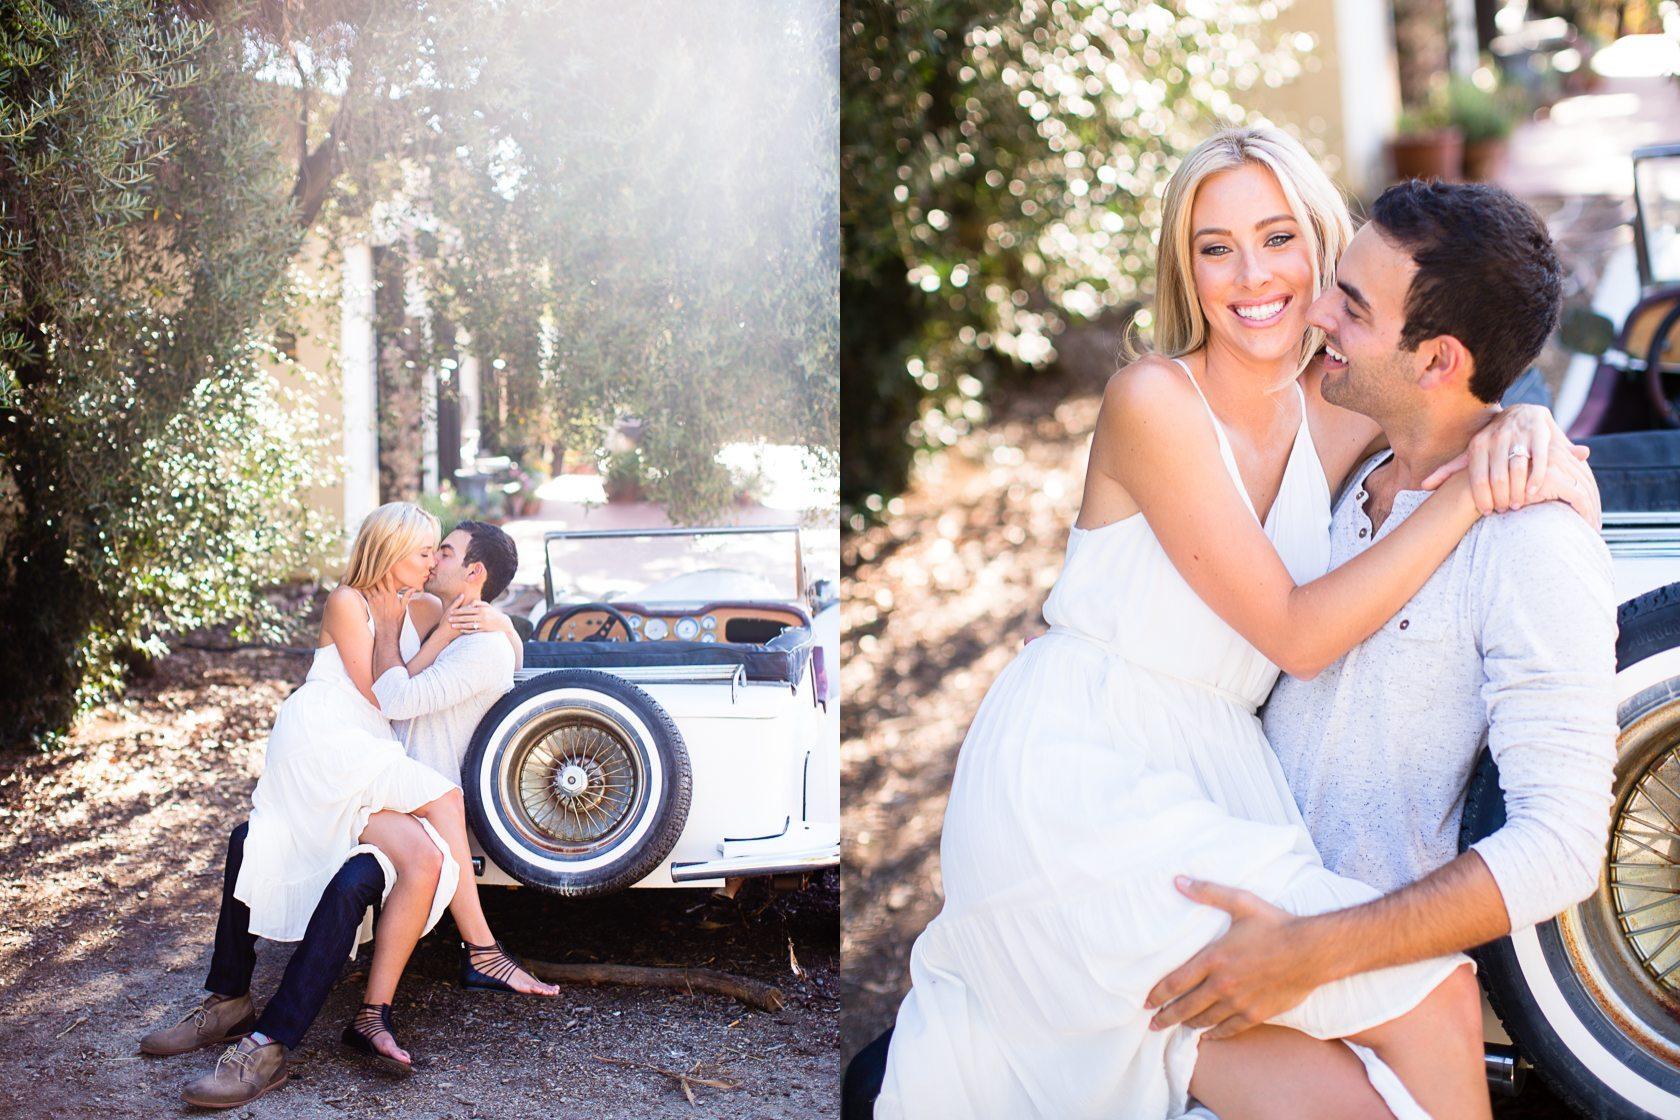 Highland_Springs_Lavender_Field_Engagement_37.jpg